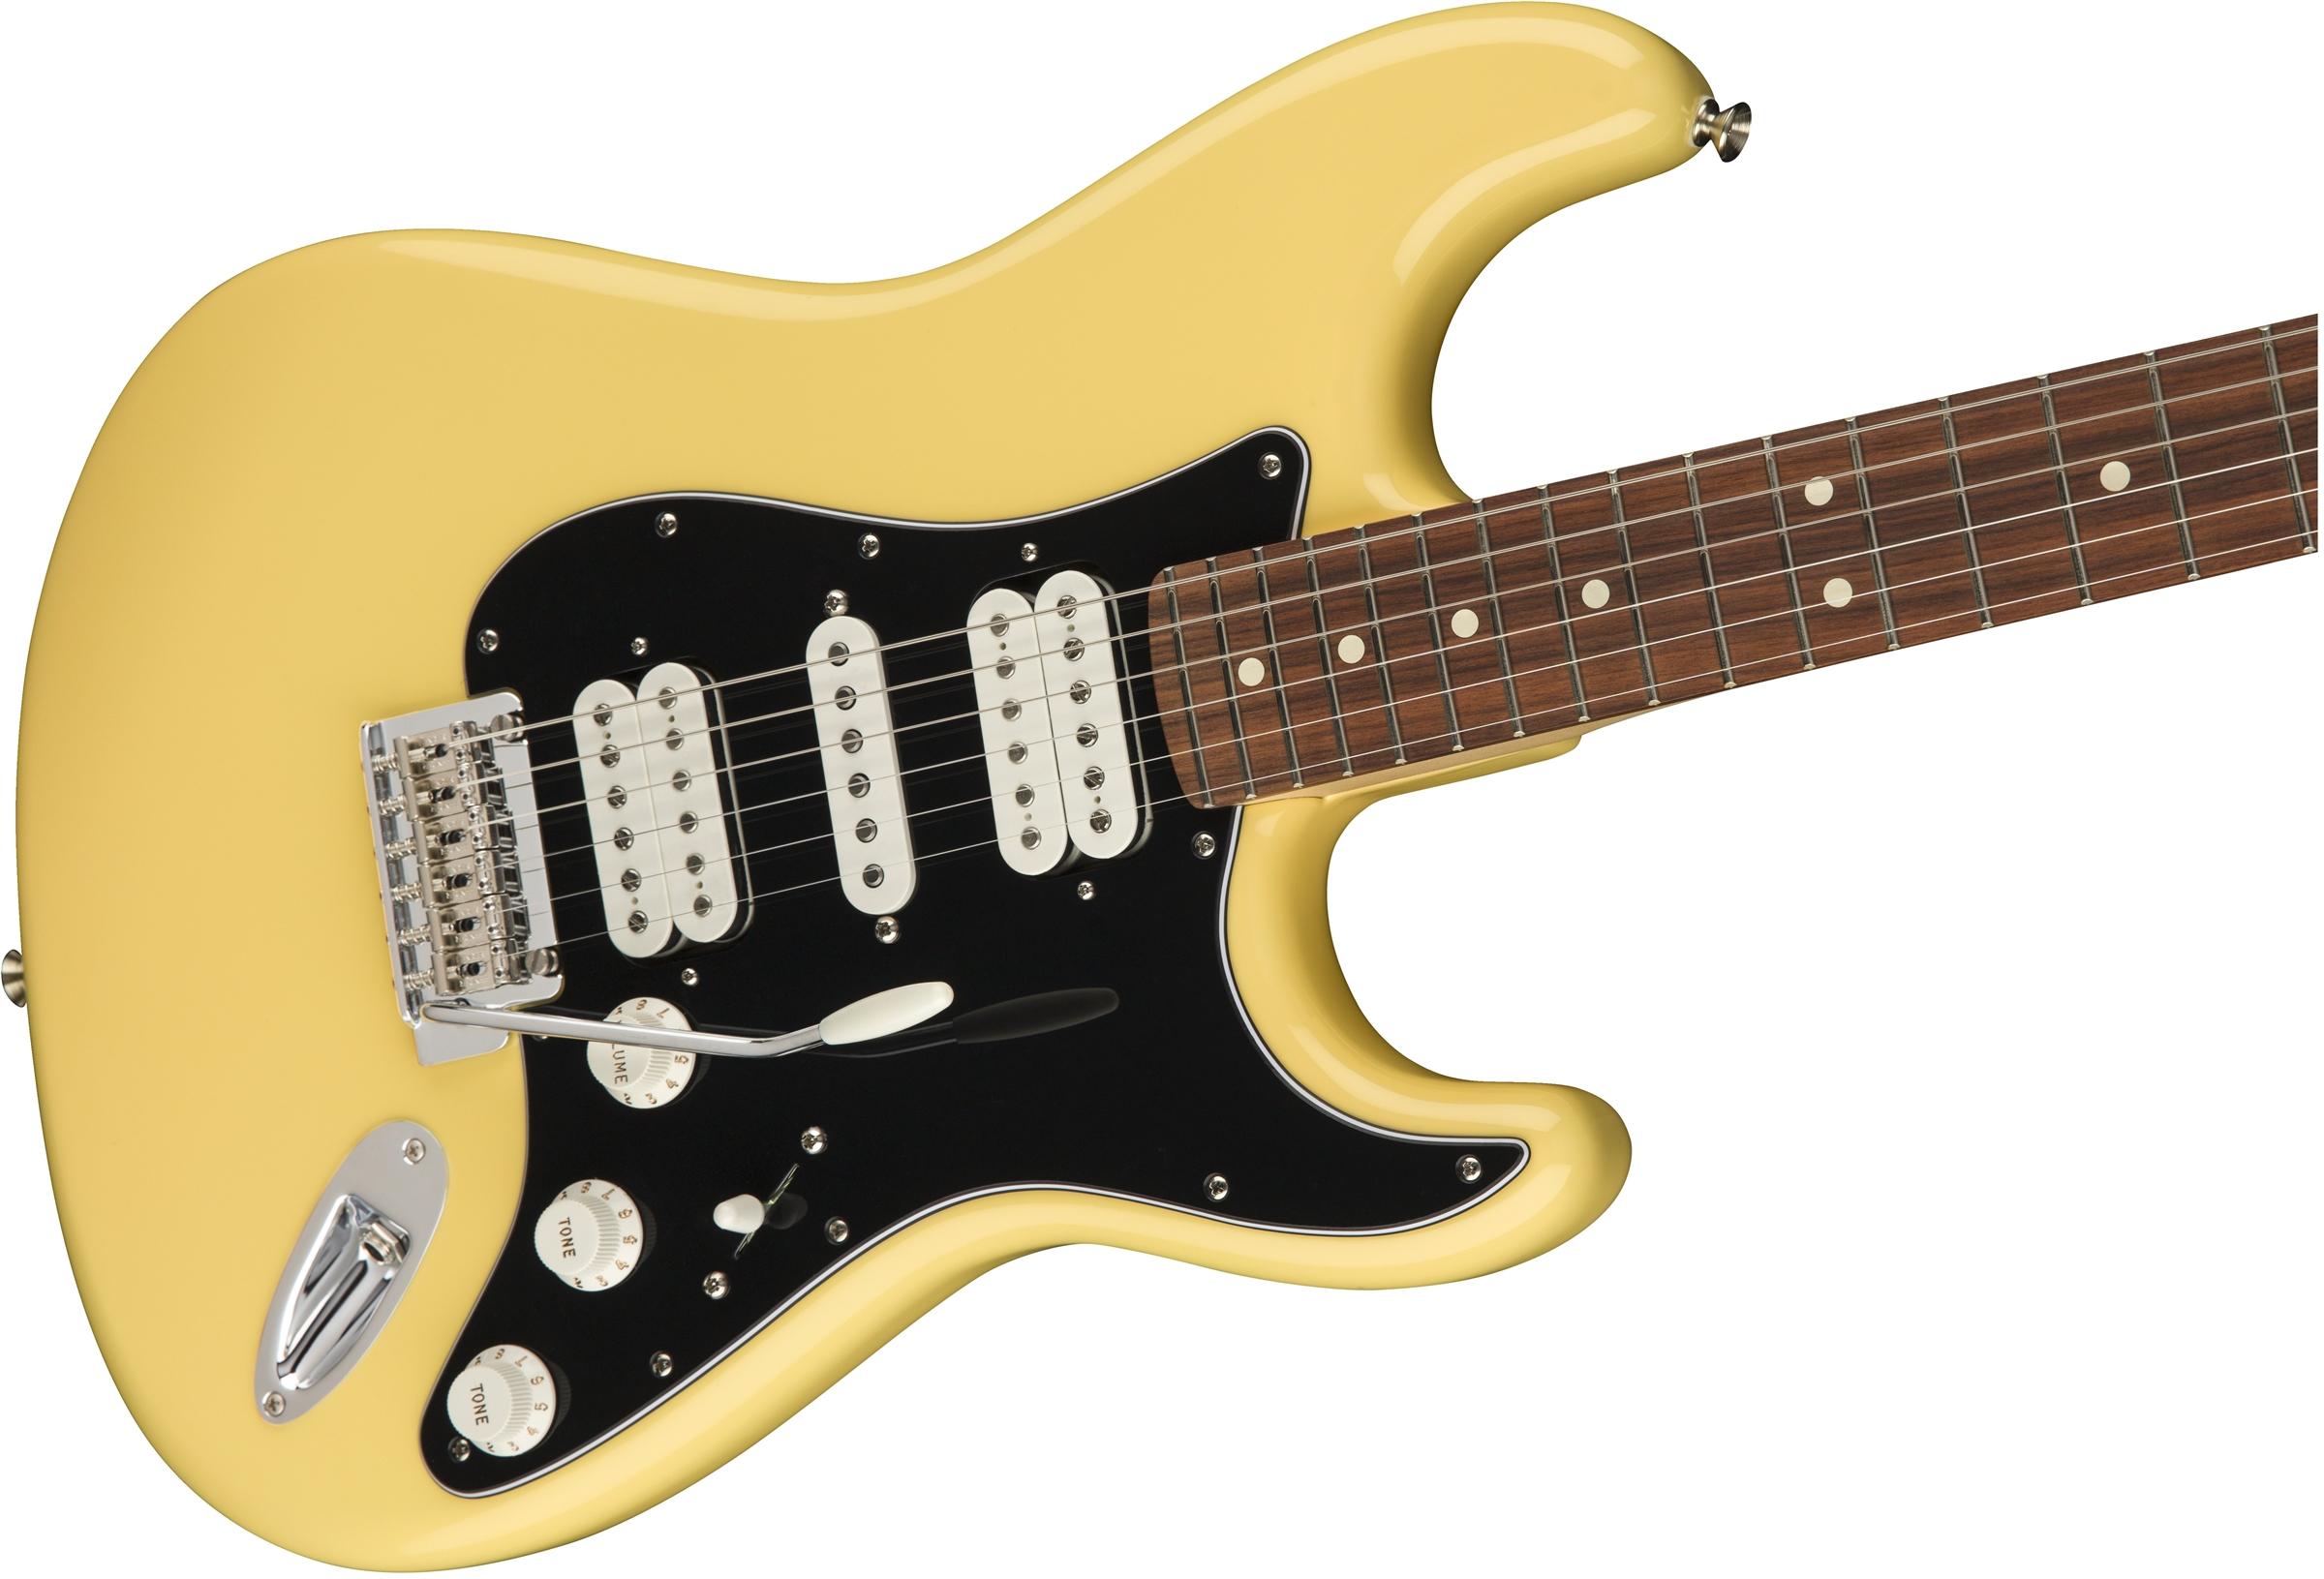 Fender Stratocaster Hsh Wiring Diagram